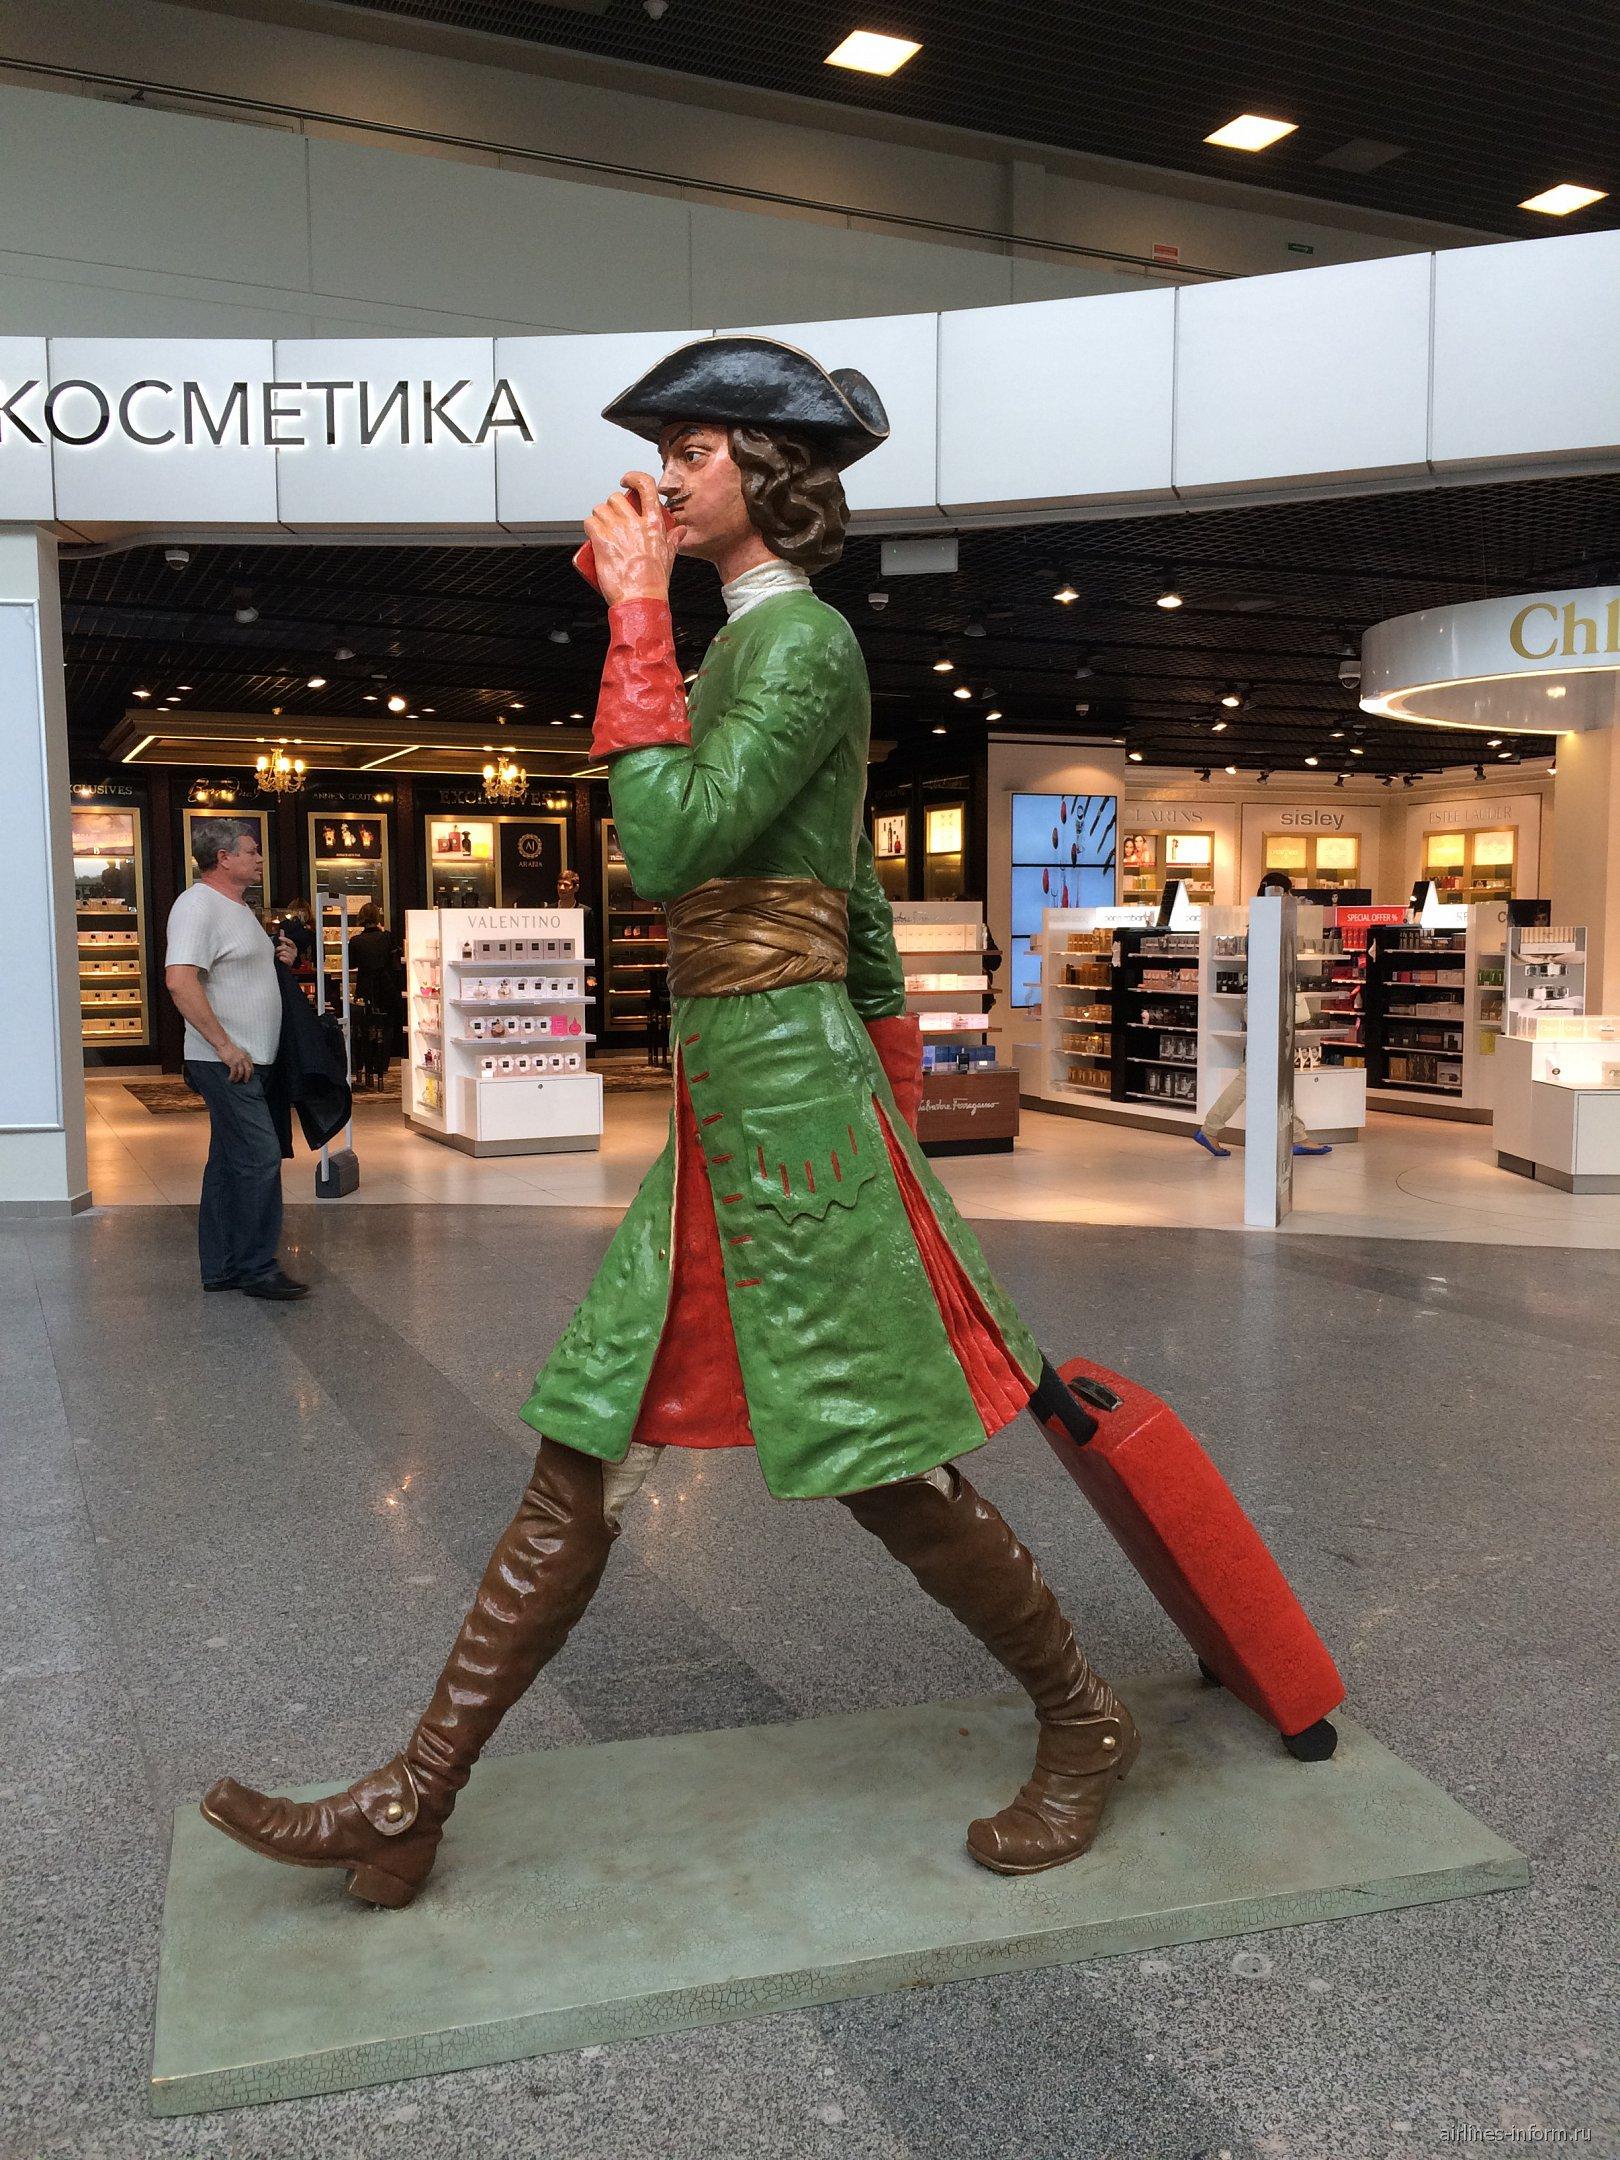 Скульптура Петра Первого в аэропорту Санкт-Петербург Пулково